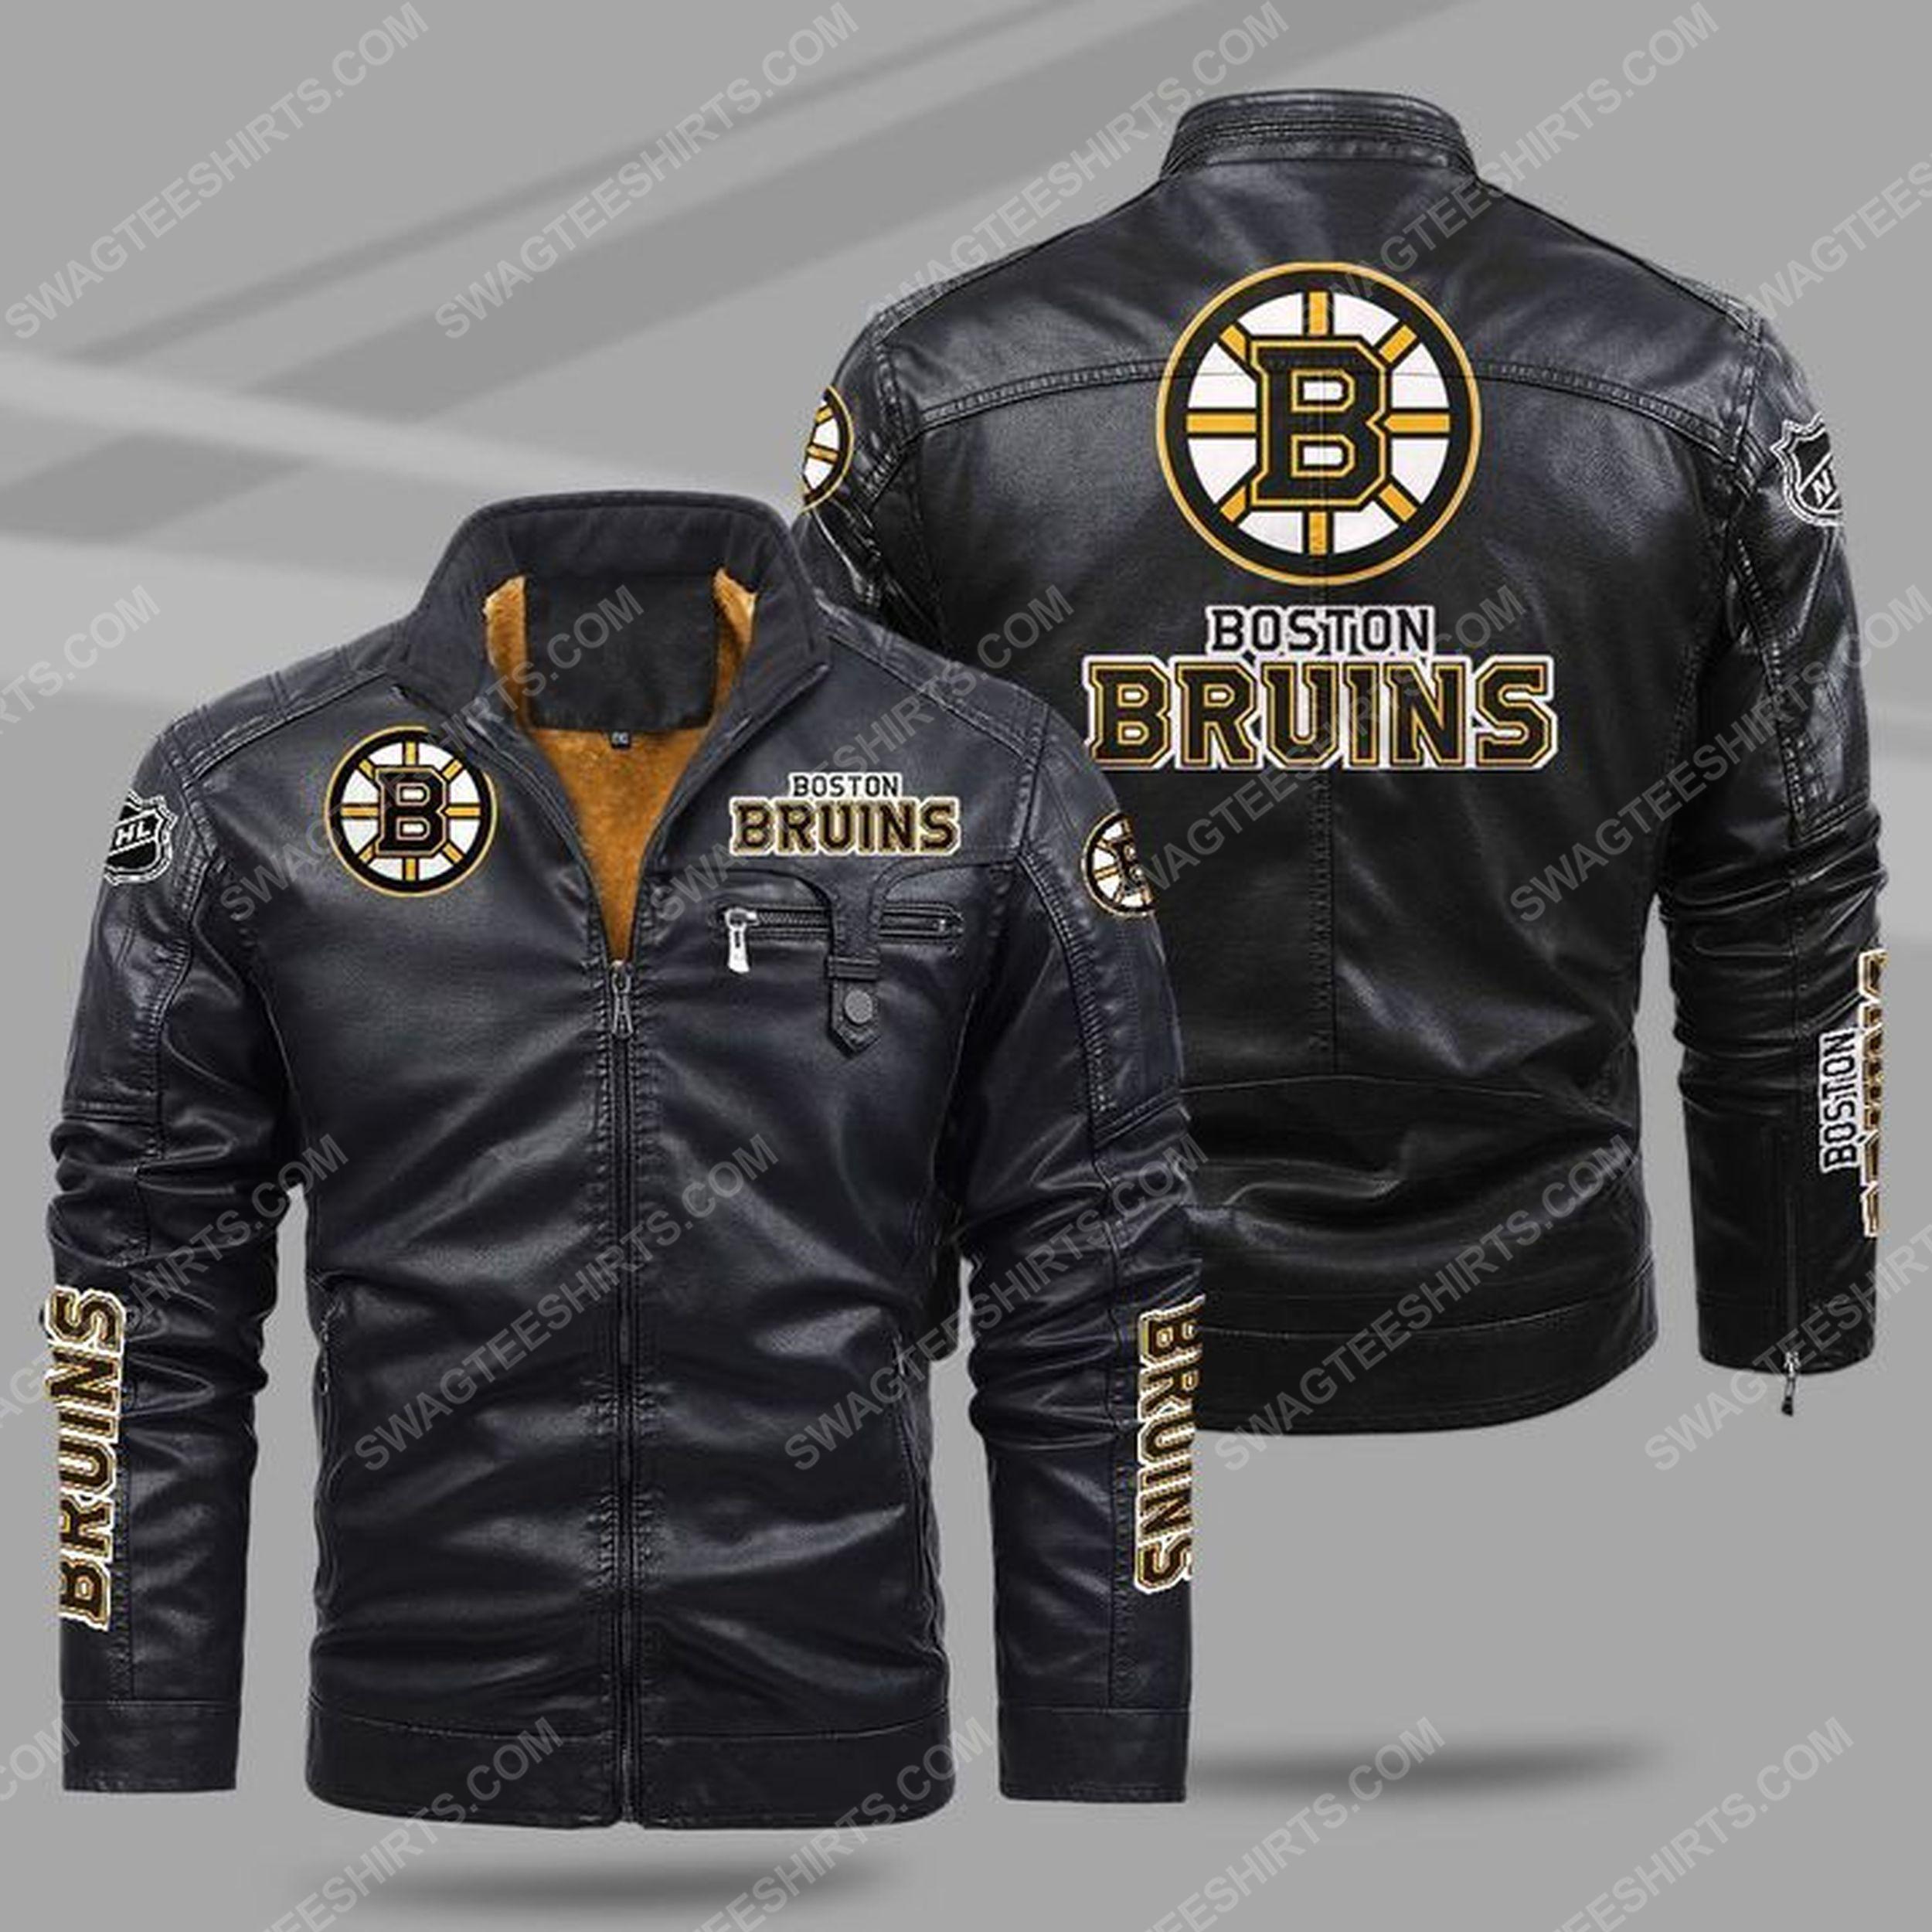 The boston bruins nhl all over print fleece leather jacket - black 1